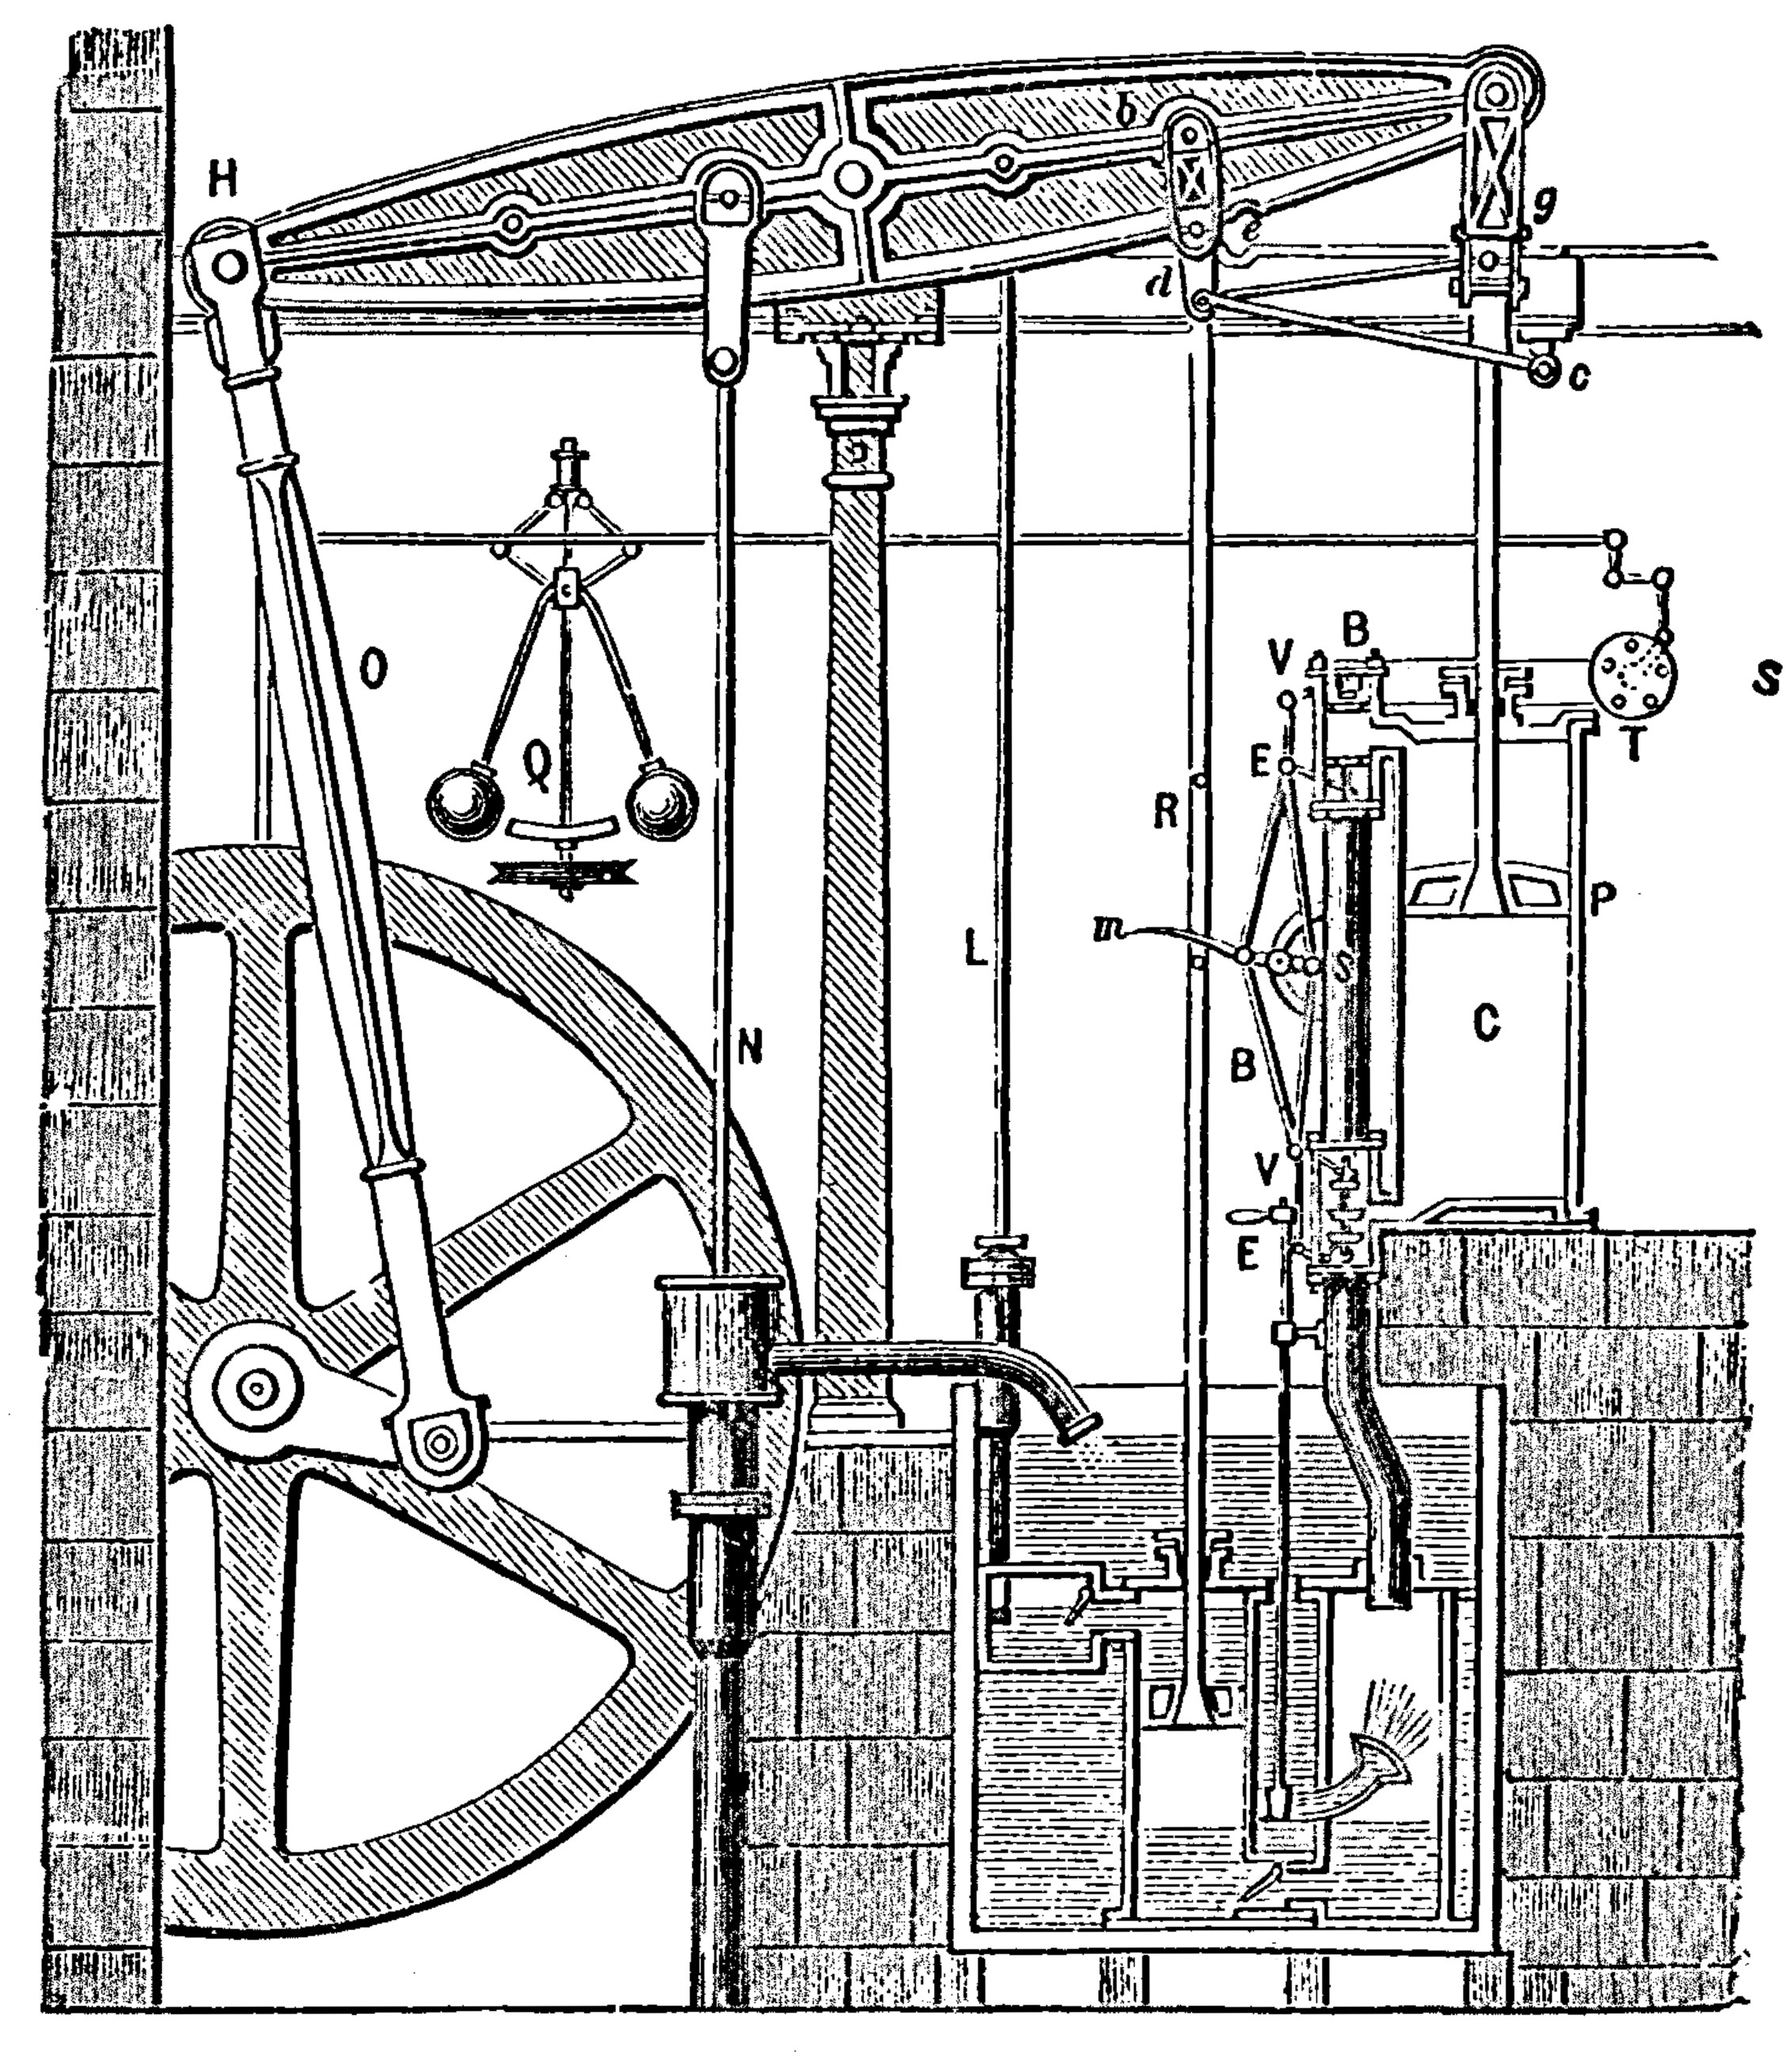 Diagram Of Steam Engine File Steamengine Boulton&watt 1784 Wikimedia Mons Of Diagram Of Steam Engine